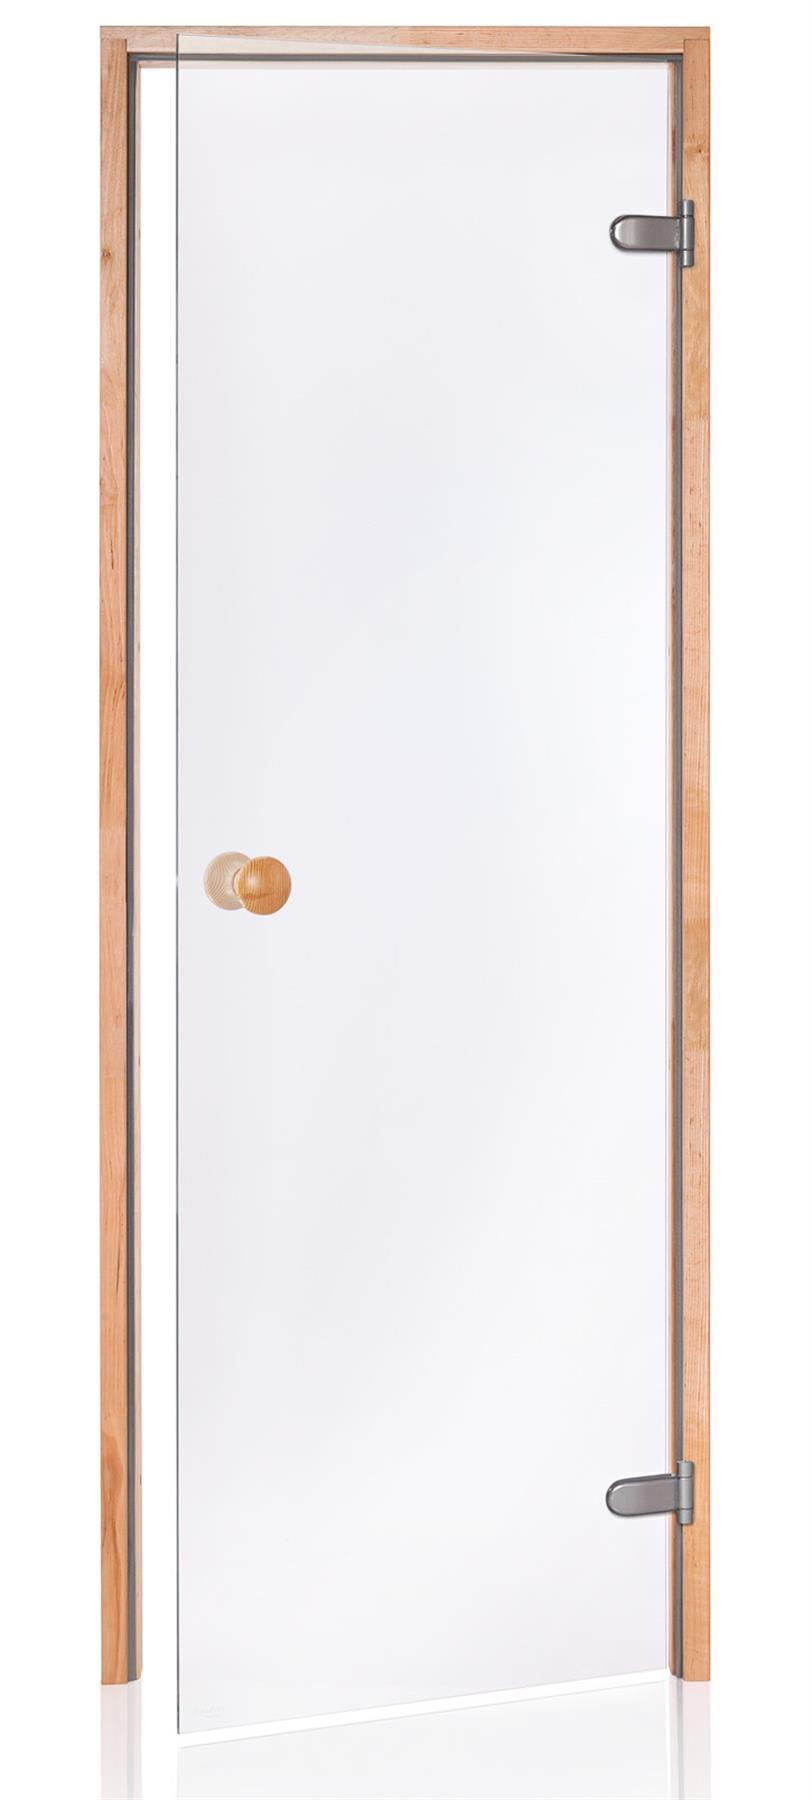 Badstudør SCAN med klart glass